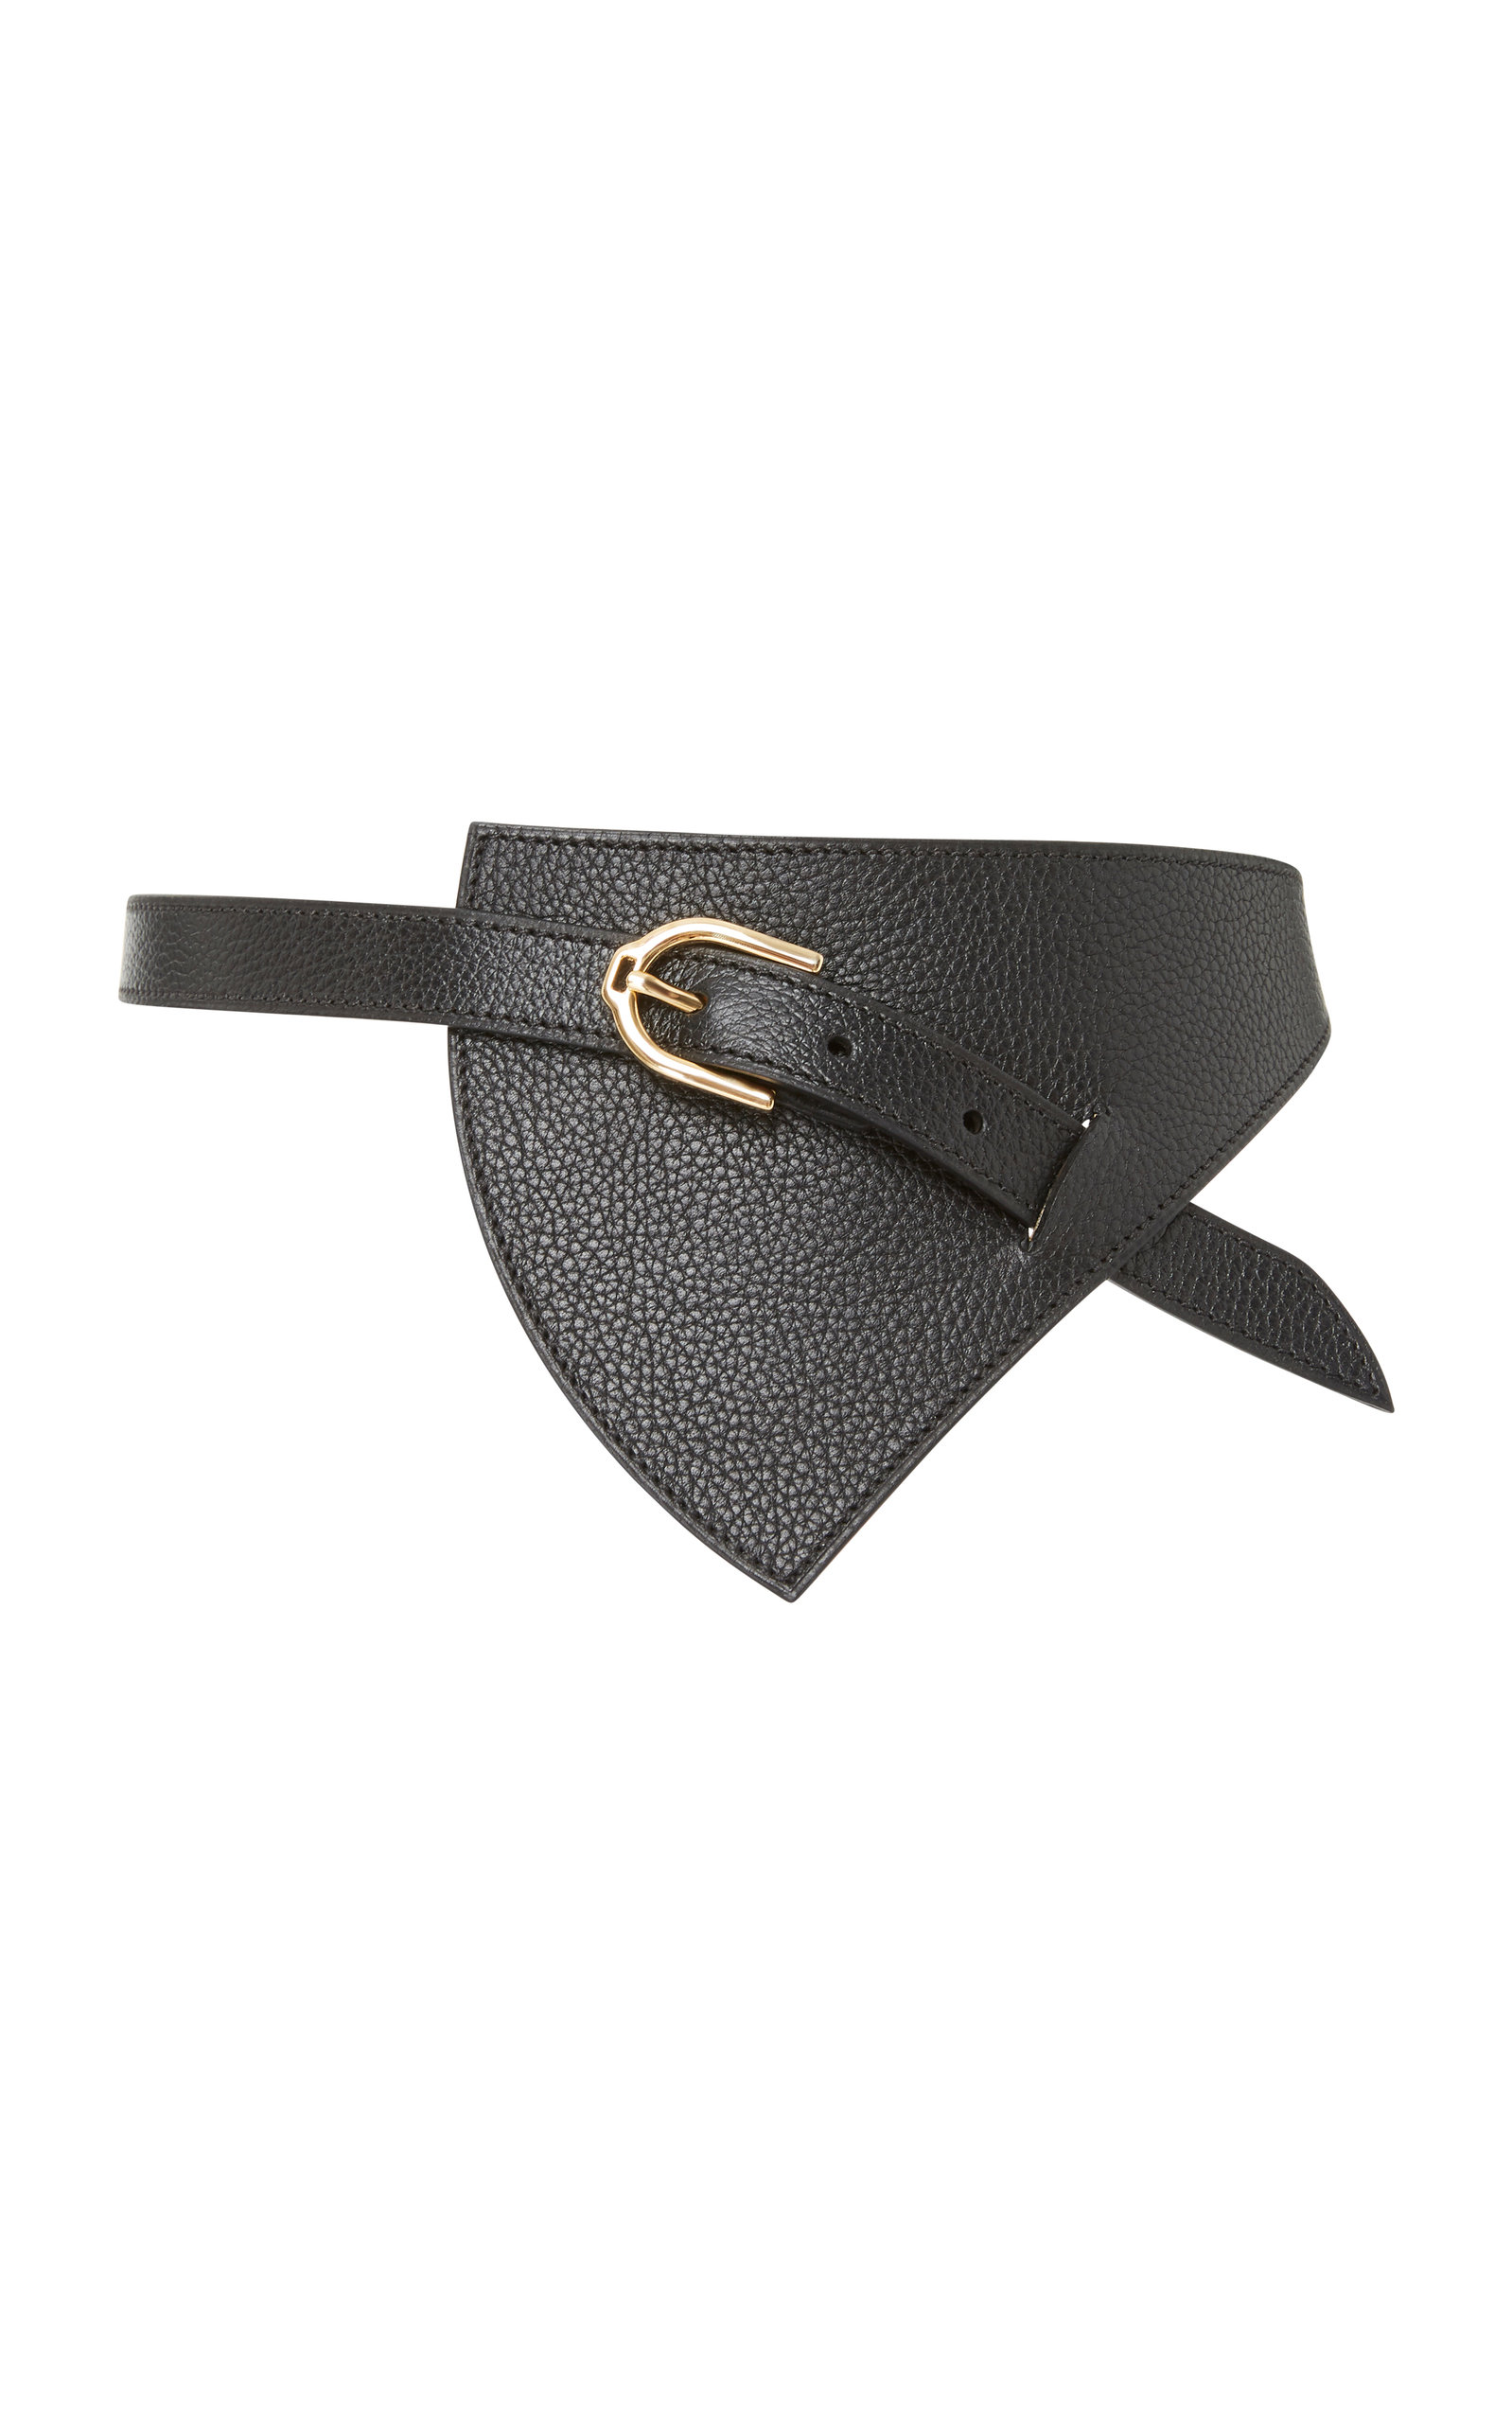 MO exclusive Reversible Triangle Leather Waist Belt Maison Vaincourt PMf3dVx8